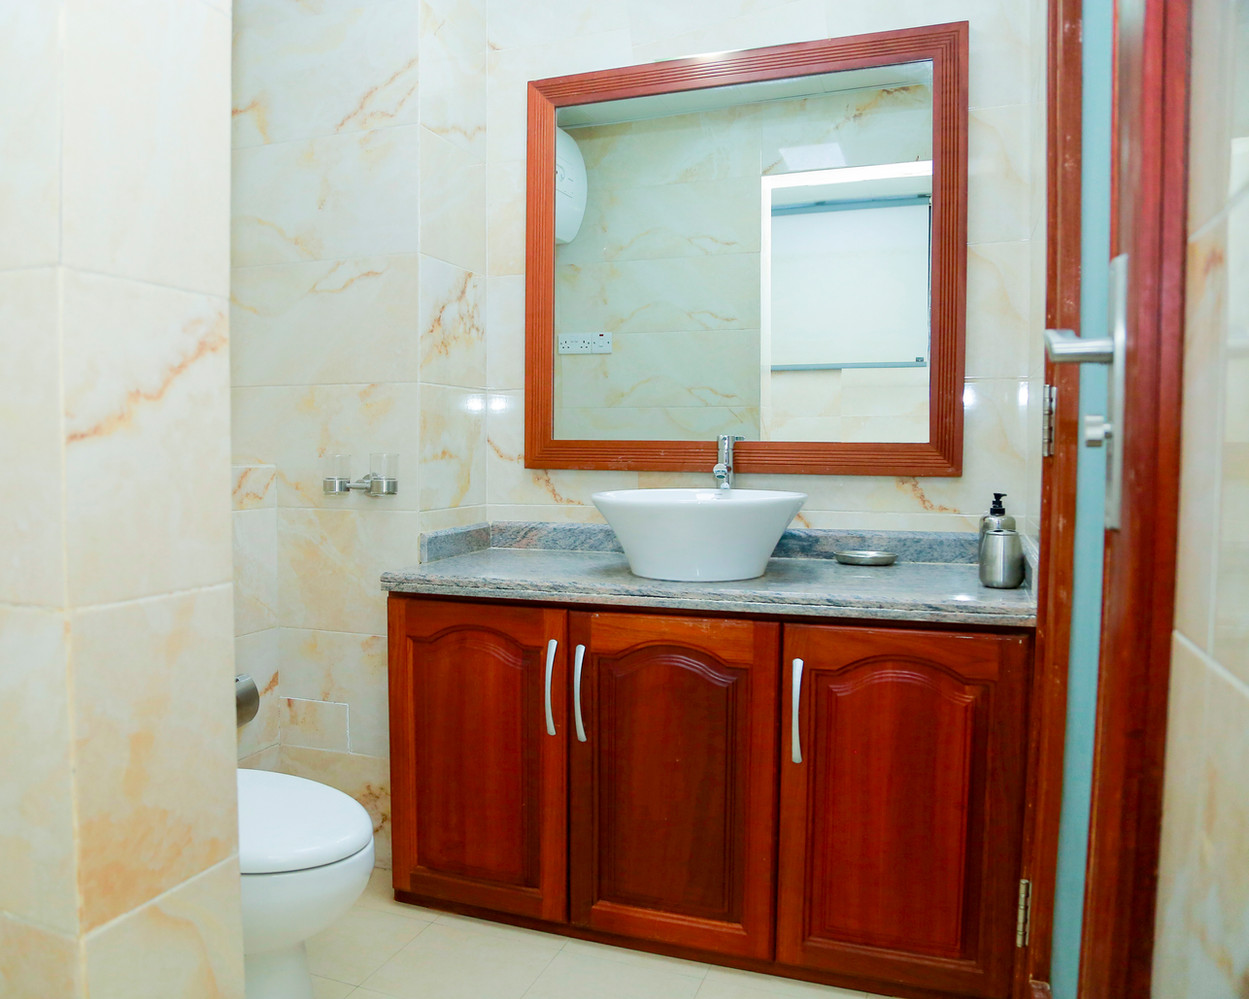 Bathroom_wash basin area-right side.jpg